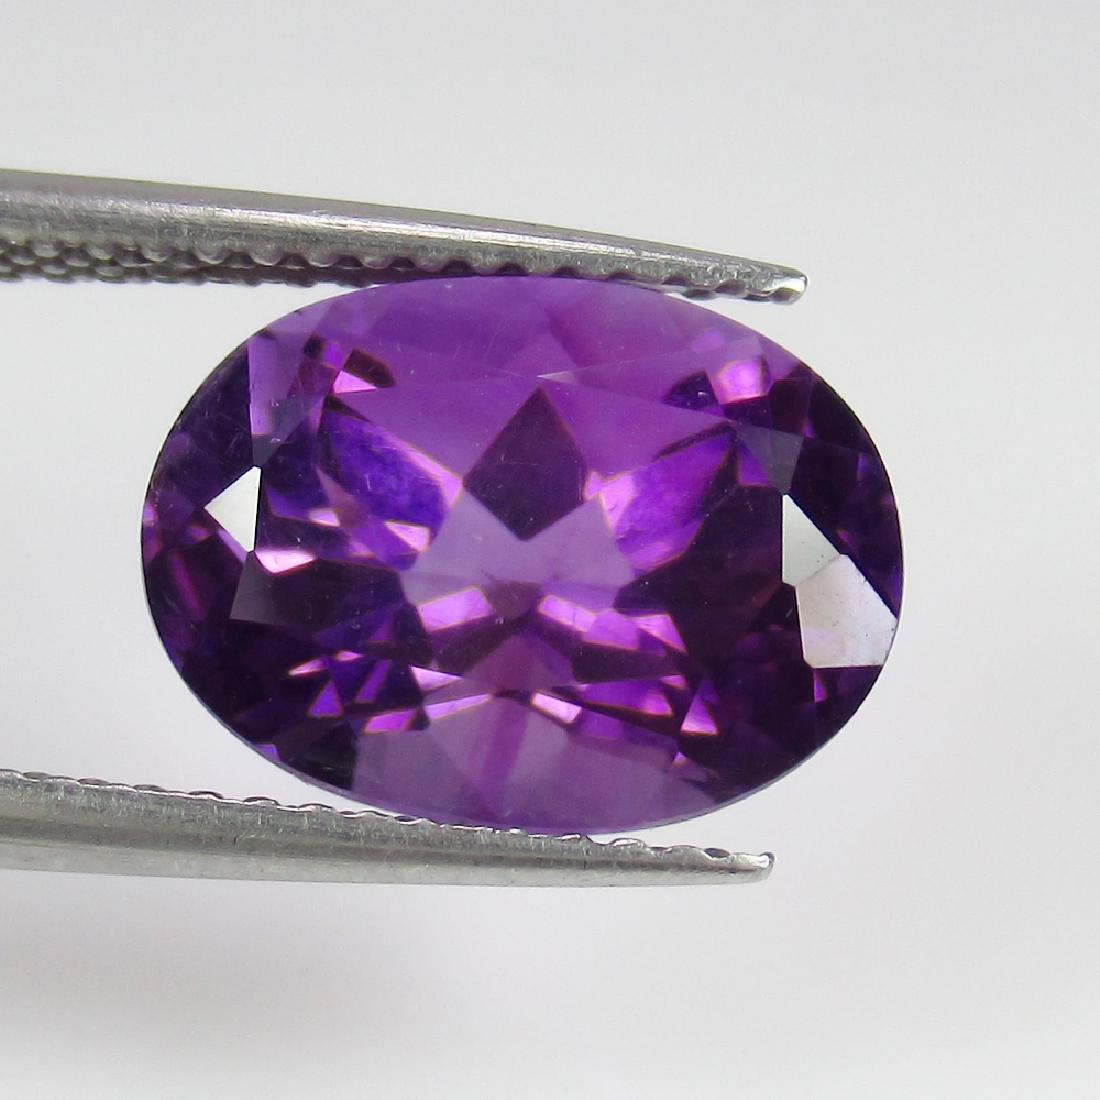 4.17 Ct Genuine Purple Amethyst Nice Oval Cut